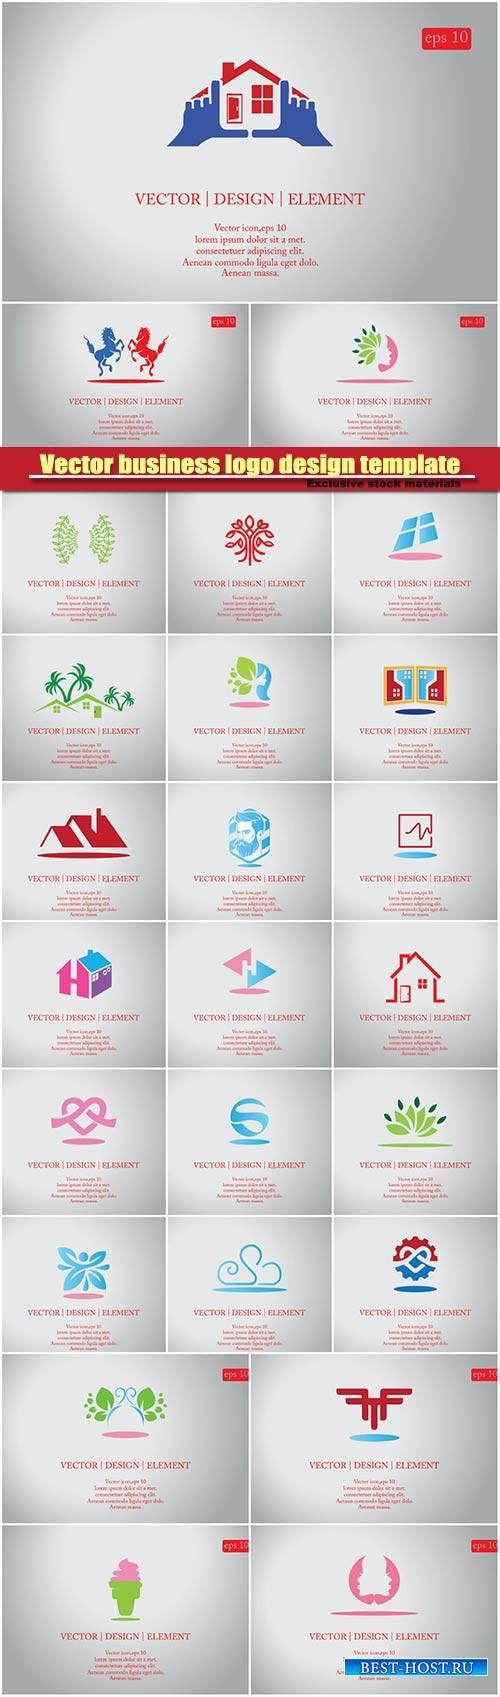 Vector business company logo design